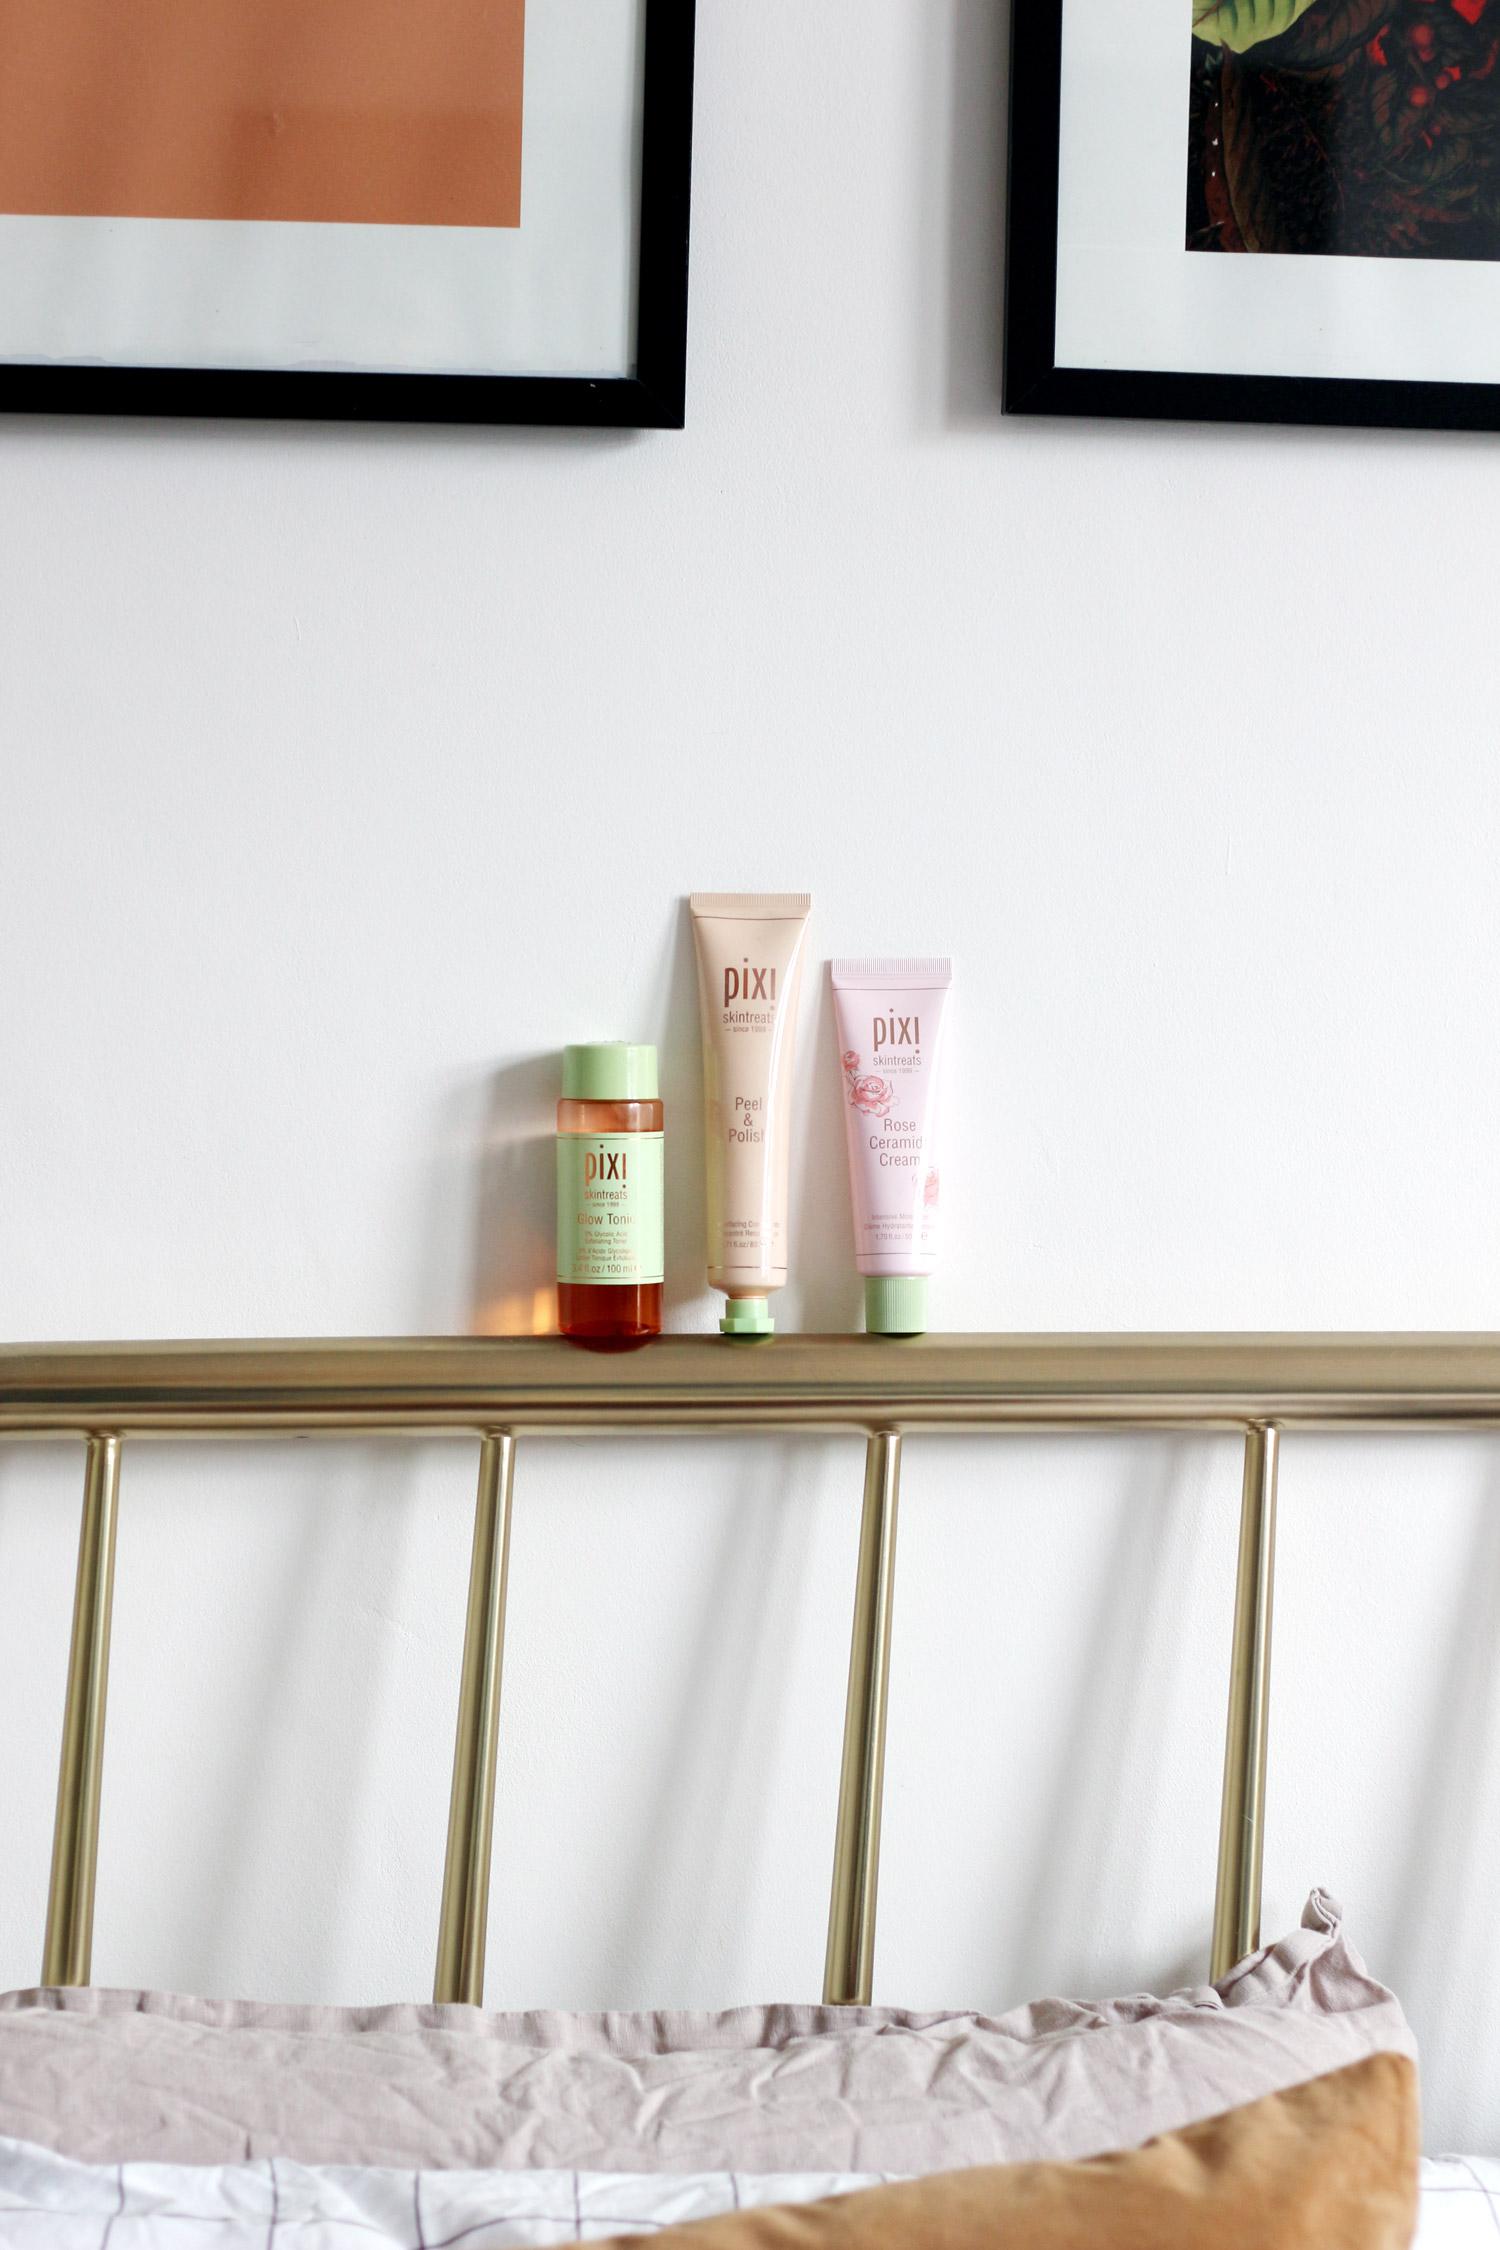 favourite-pixi-beauty-picks-glow-tonic-rose-ceramide-cream-peel-and-polish